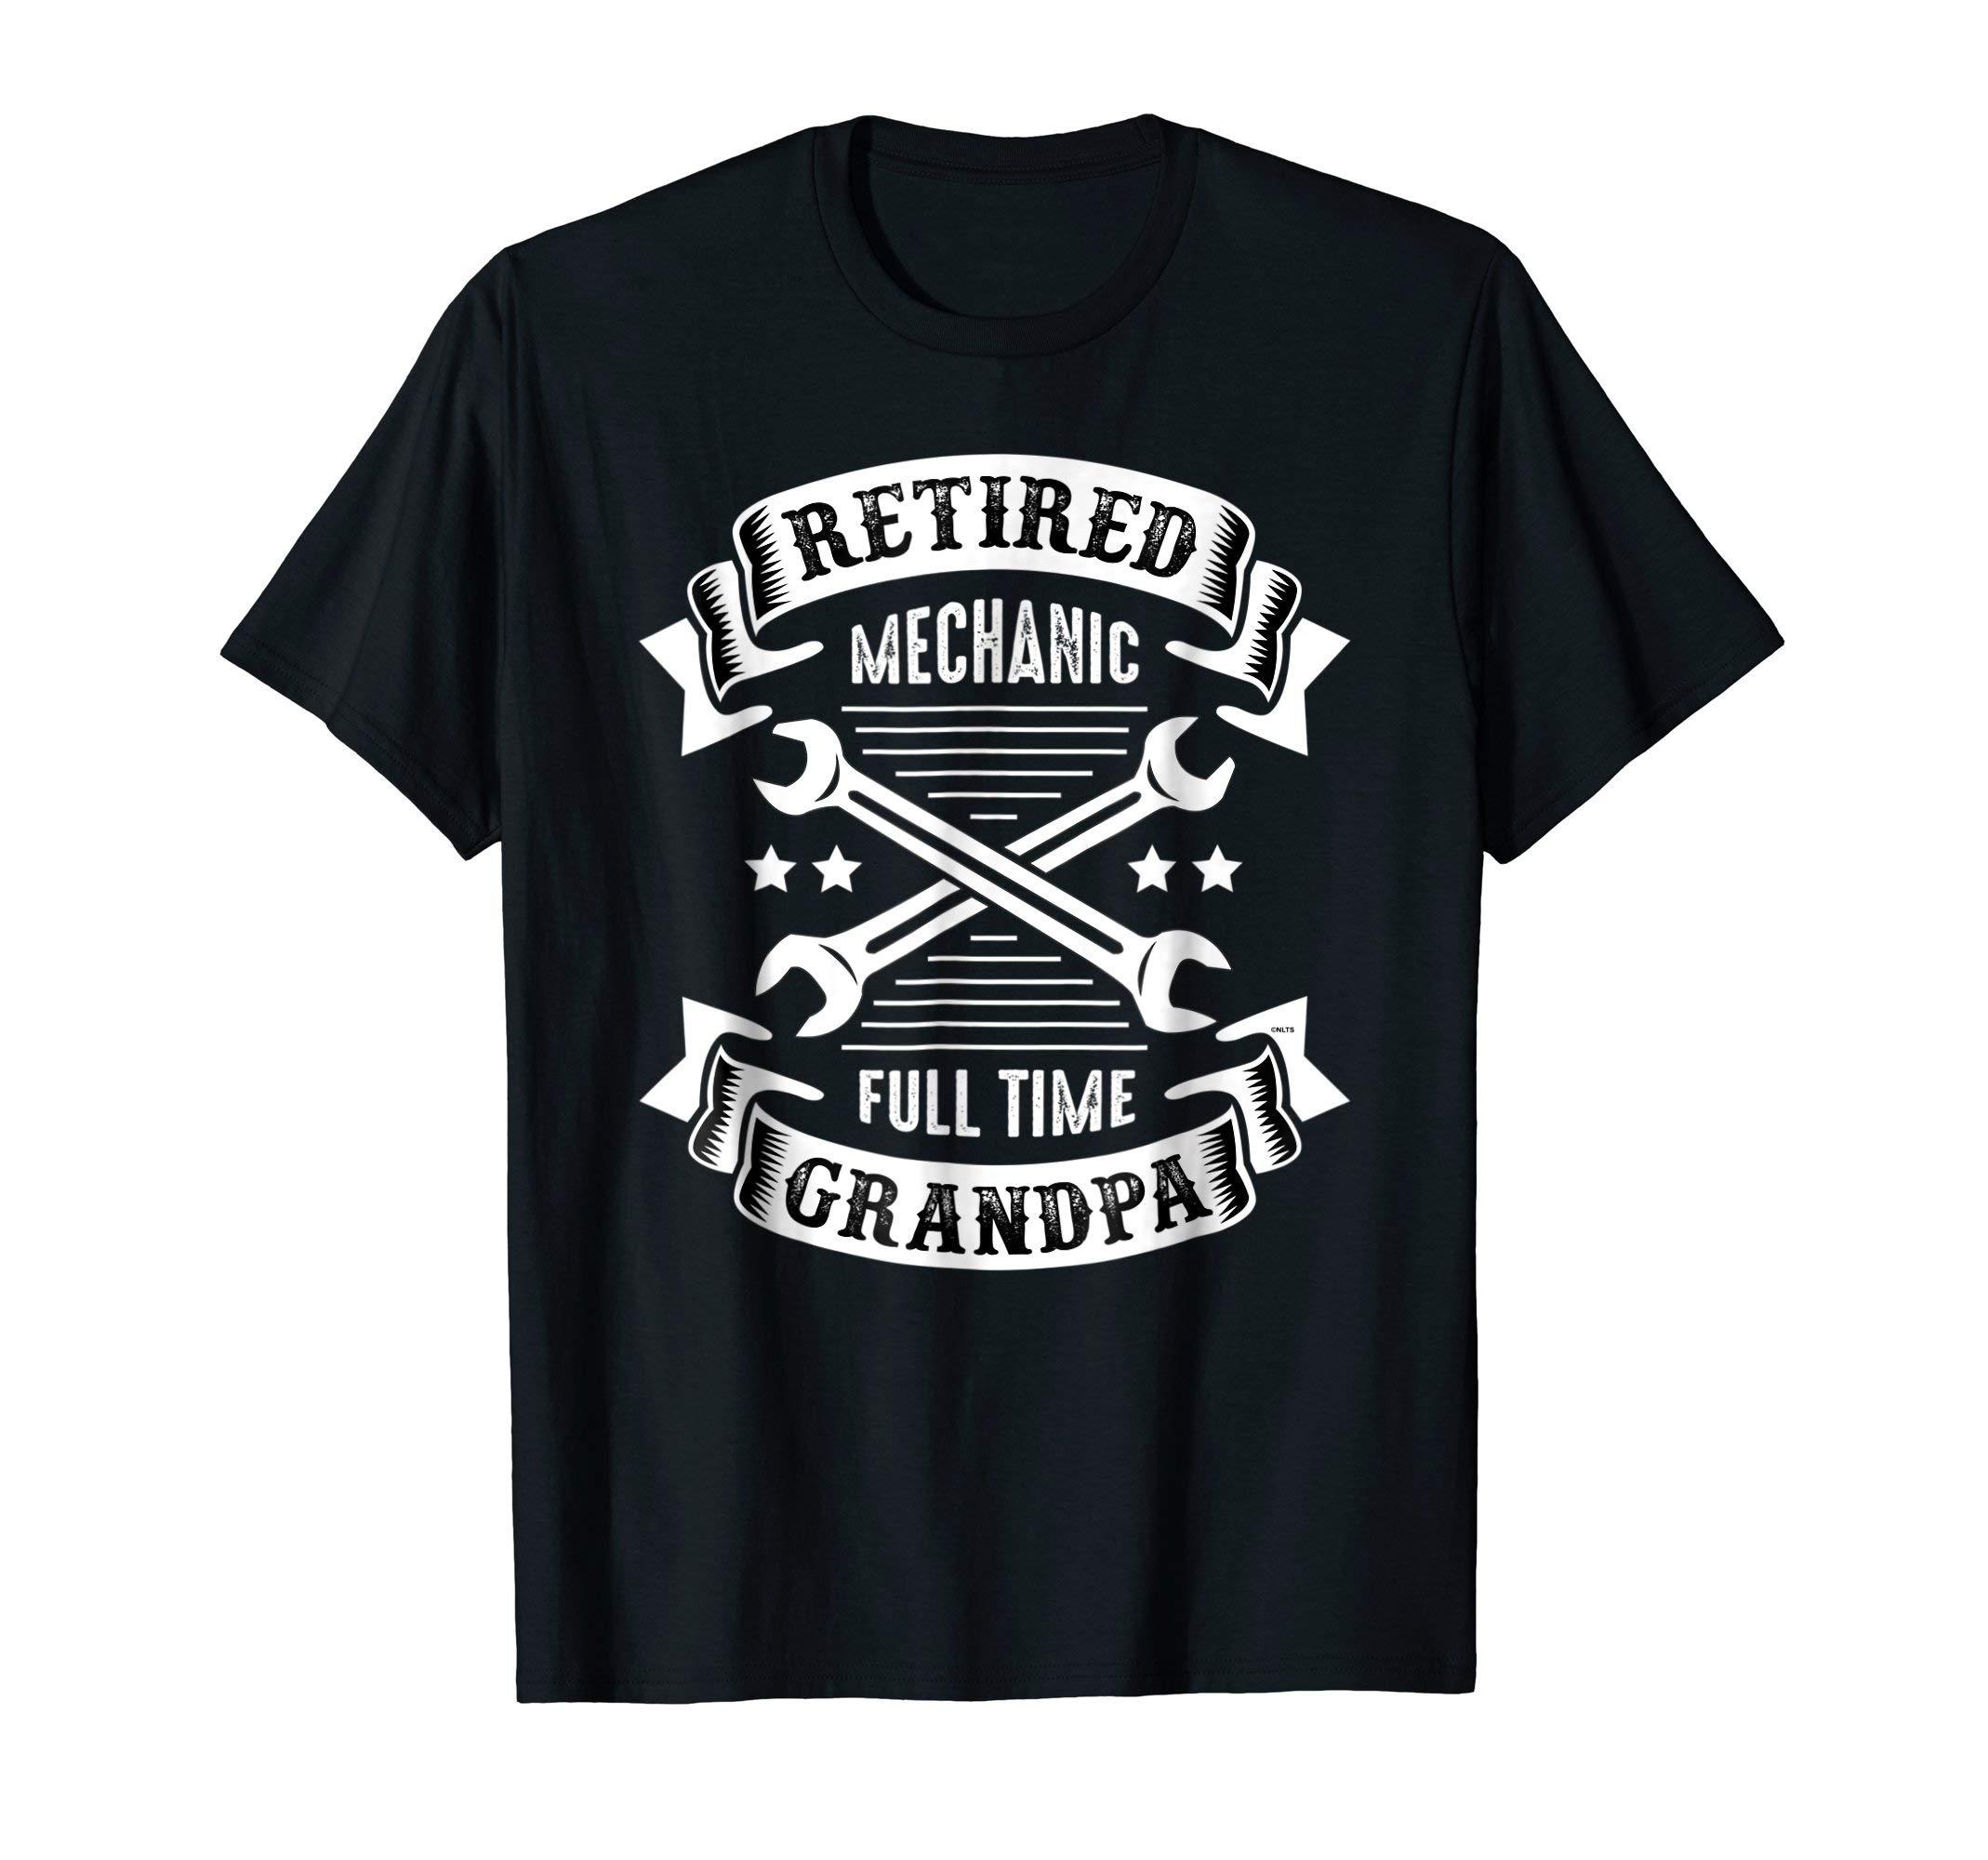 Retired-Mechanic-Full-Time-Grandpa-T-Shirt-Gifts-Shirt-Tee